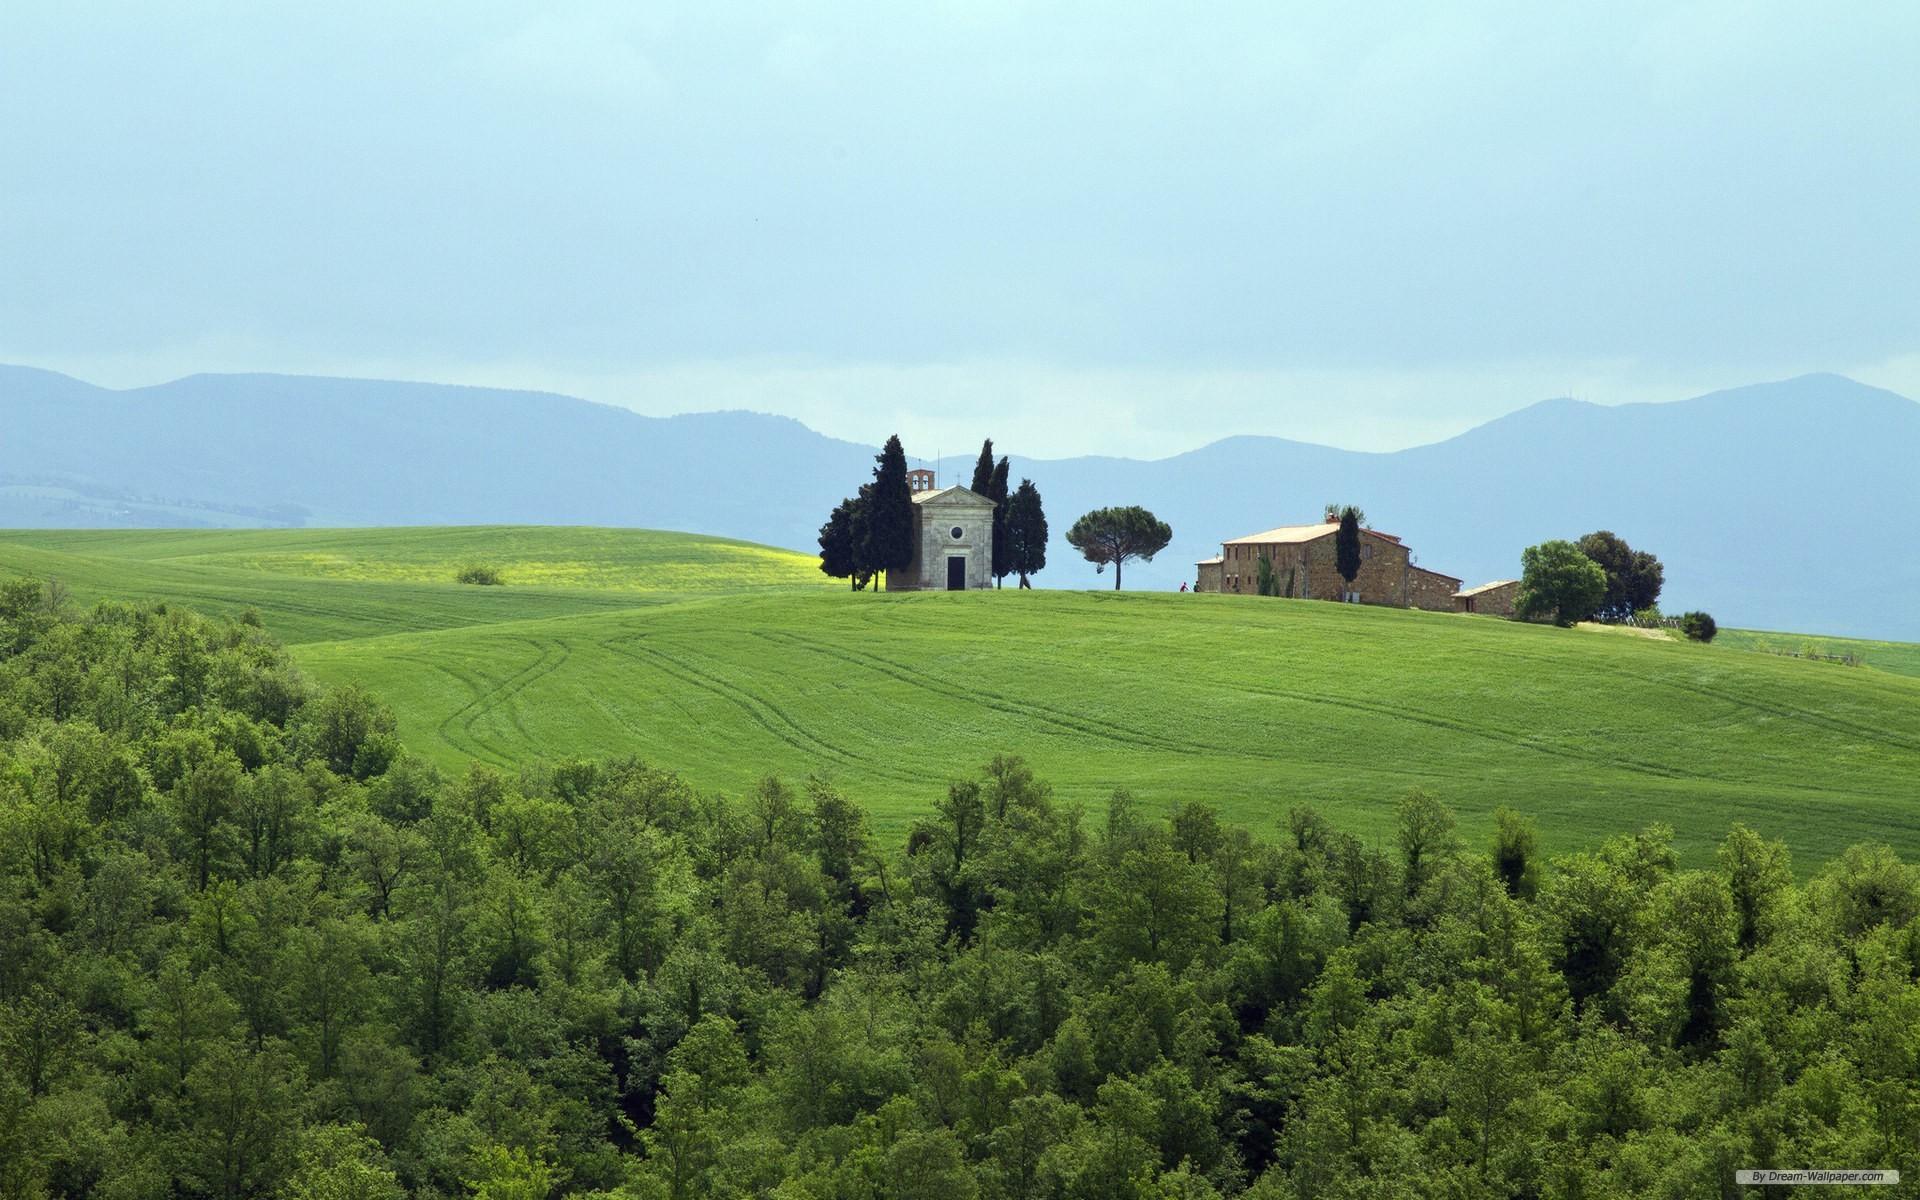 43 tuscany wallpaper for desktop on wallpapersafari - Italy screensaver ...